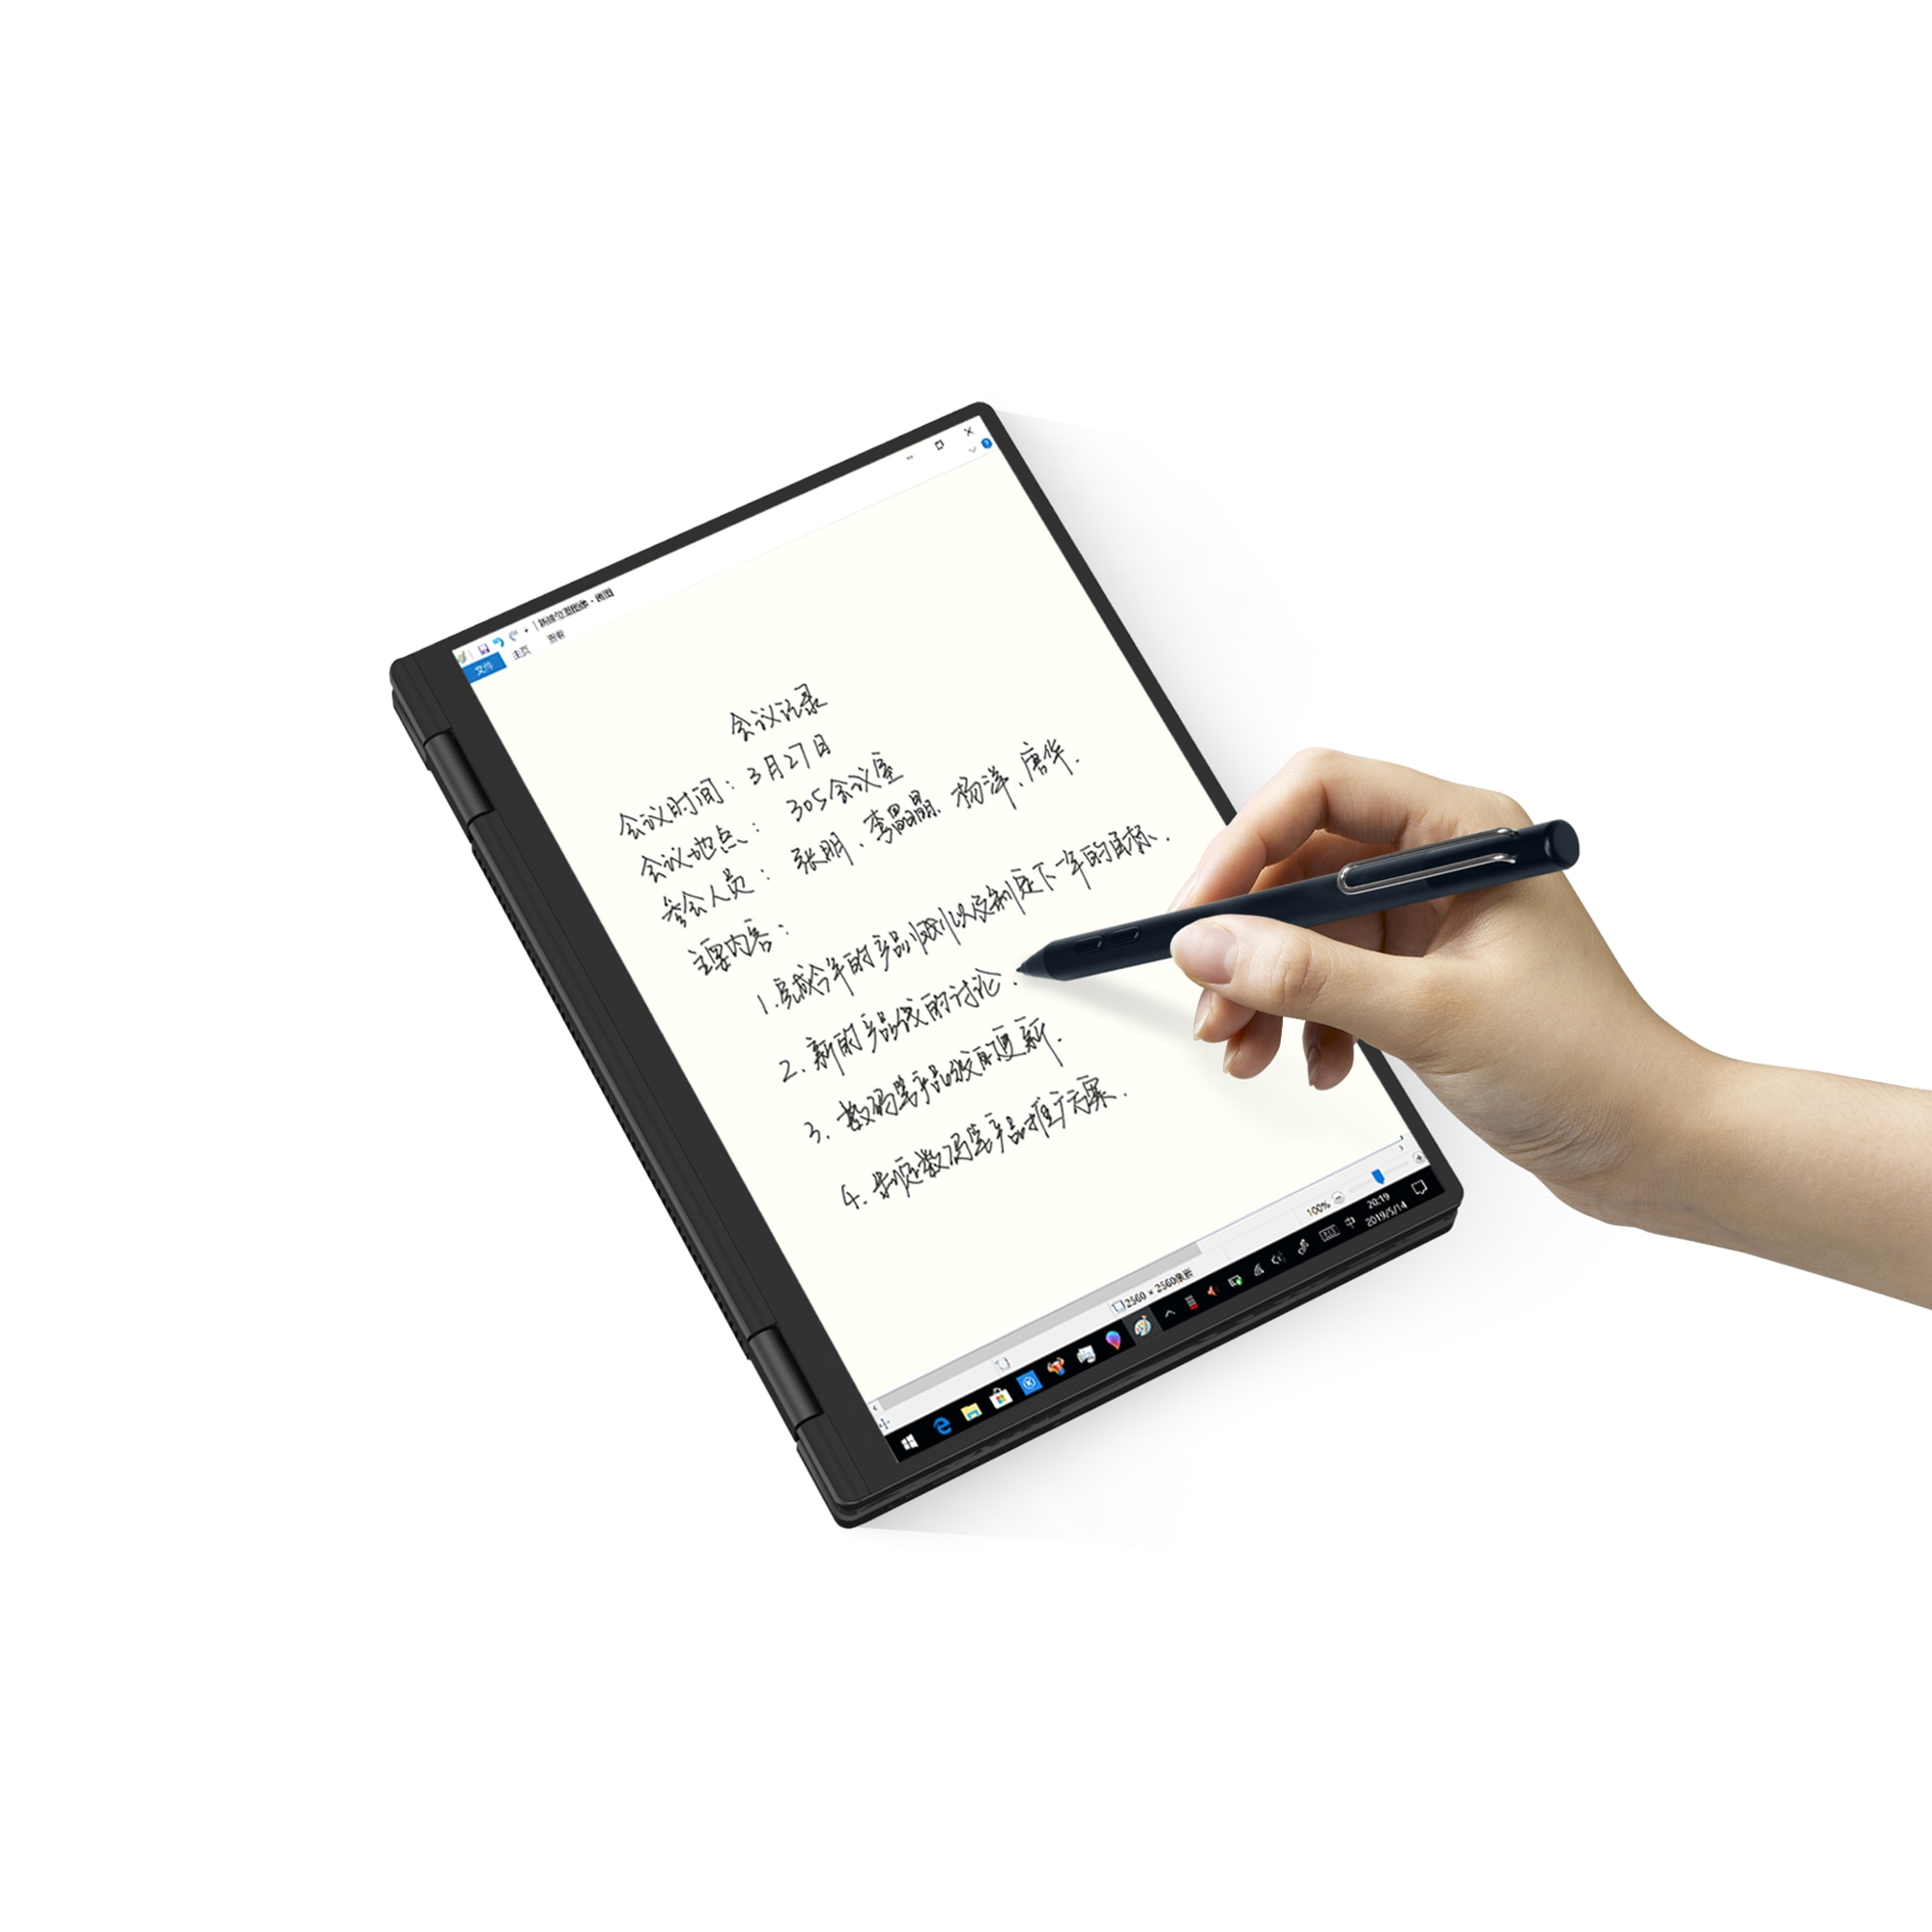 Onemix 4 10.1 Inch Pocket laptop Computer One Mix 4 Platinum Netbook i7-1160G7 16G RAM 1TB SSD IPS Touch Screen Windows 10